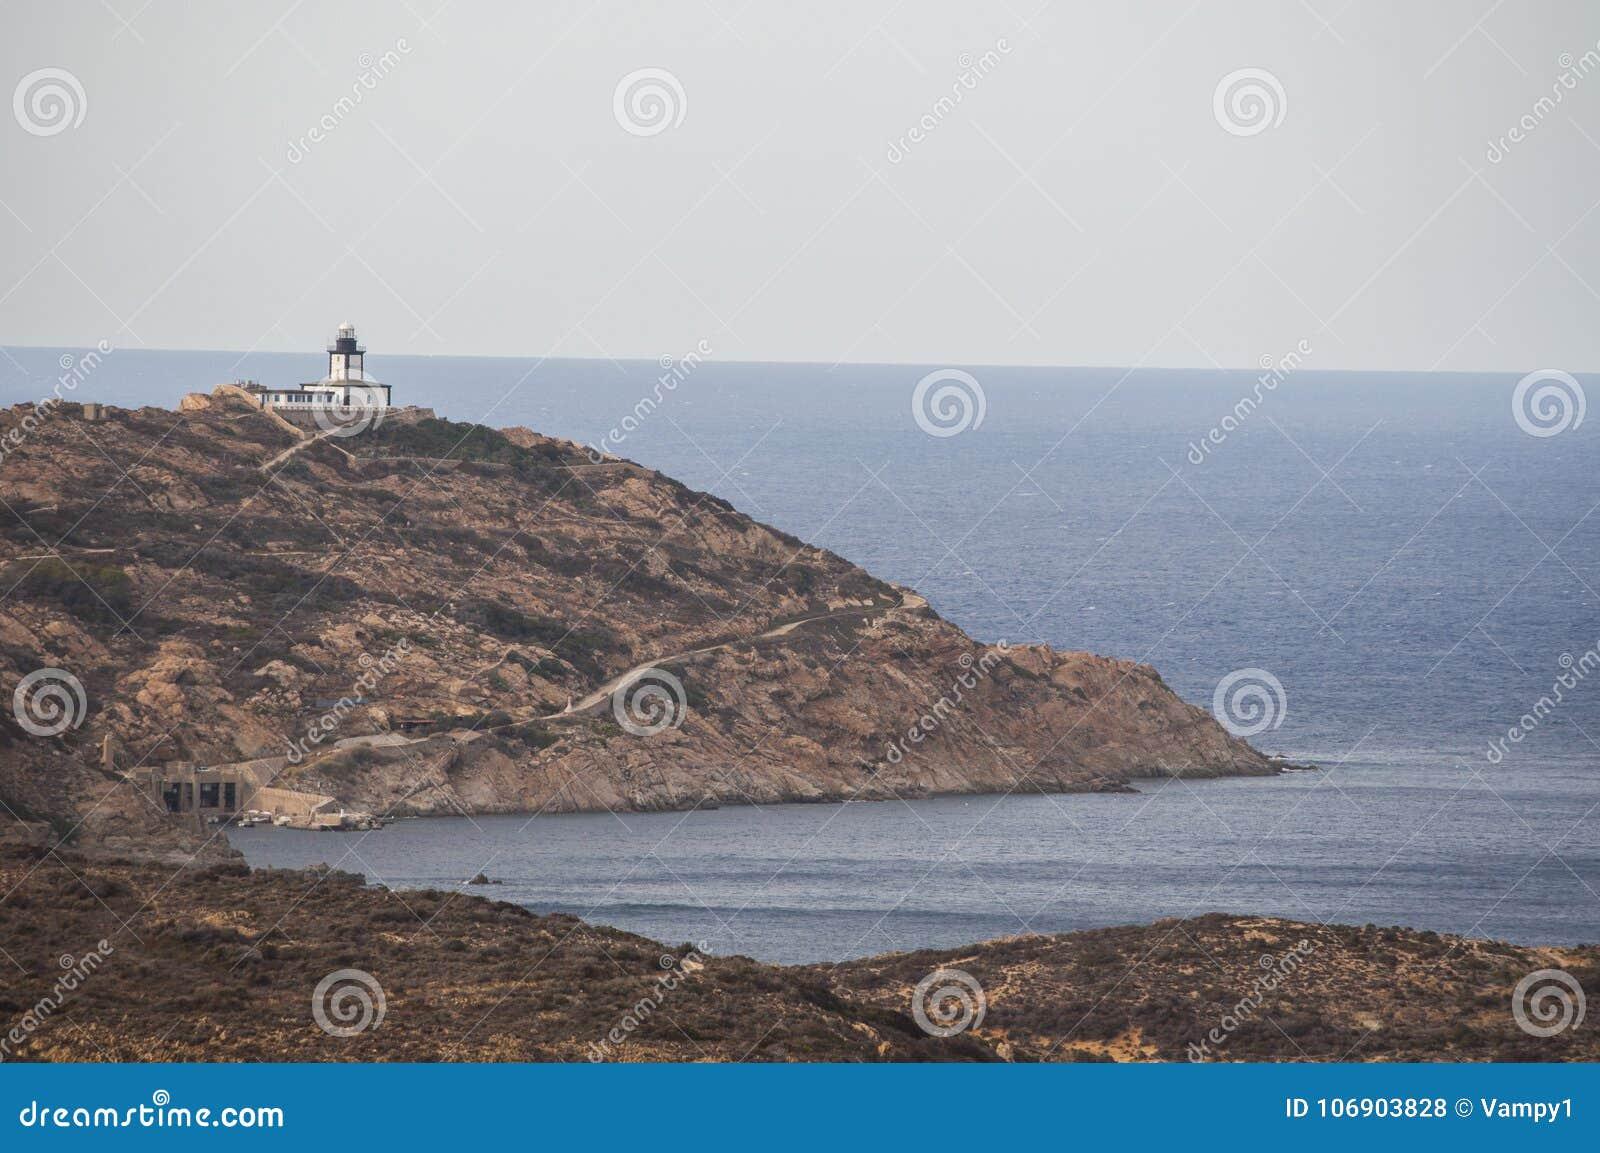 Calvi, Revellata latarnia morska, plaża, Pointe De Los Angeles Revellata, linia horyzontu, Corsica, Haute Corse, Francja, Europa,